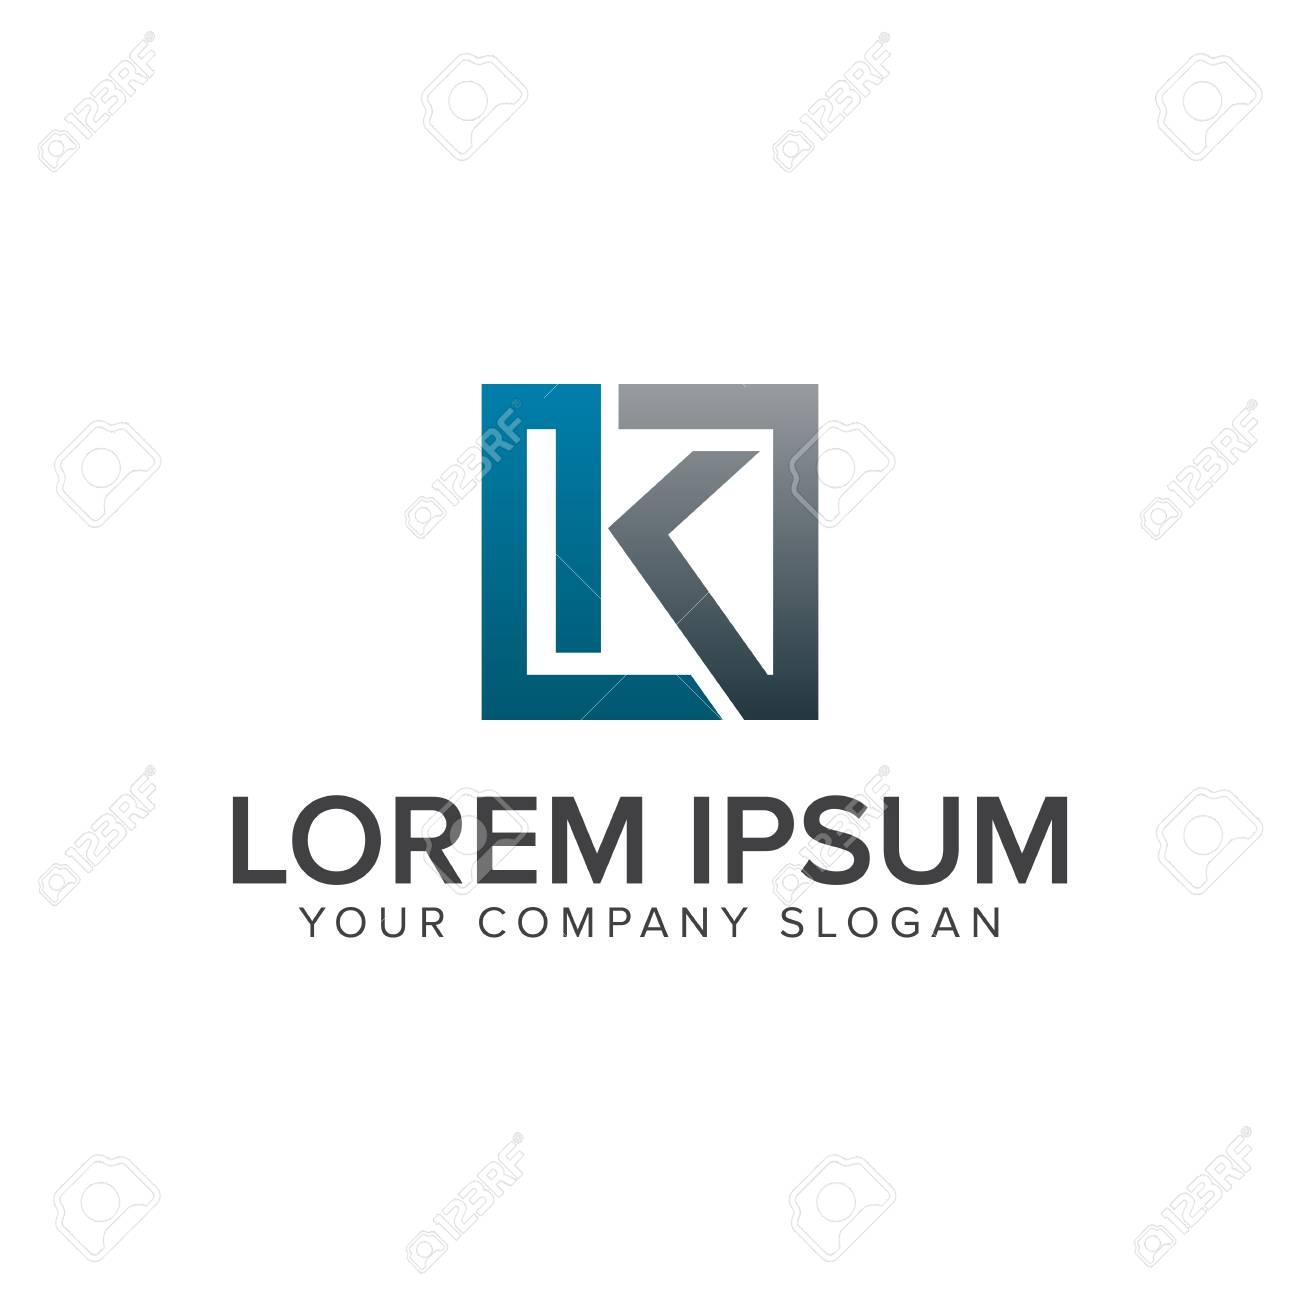 letter k logo design concept template stock vector 84733562